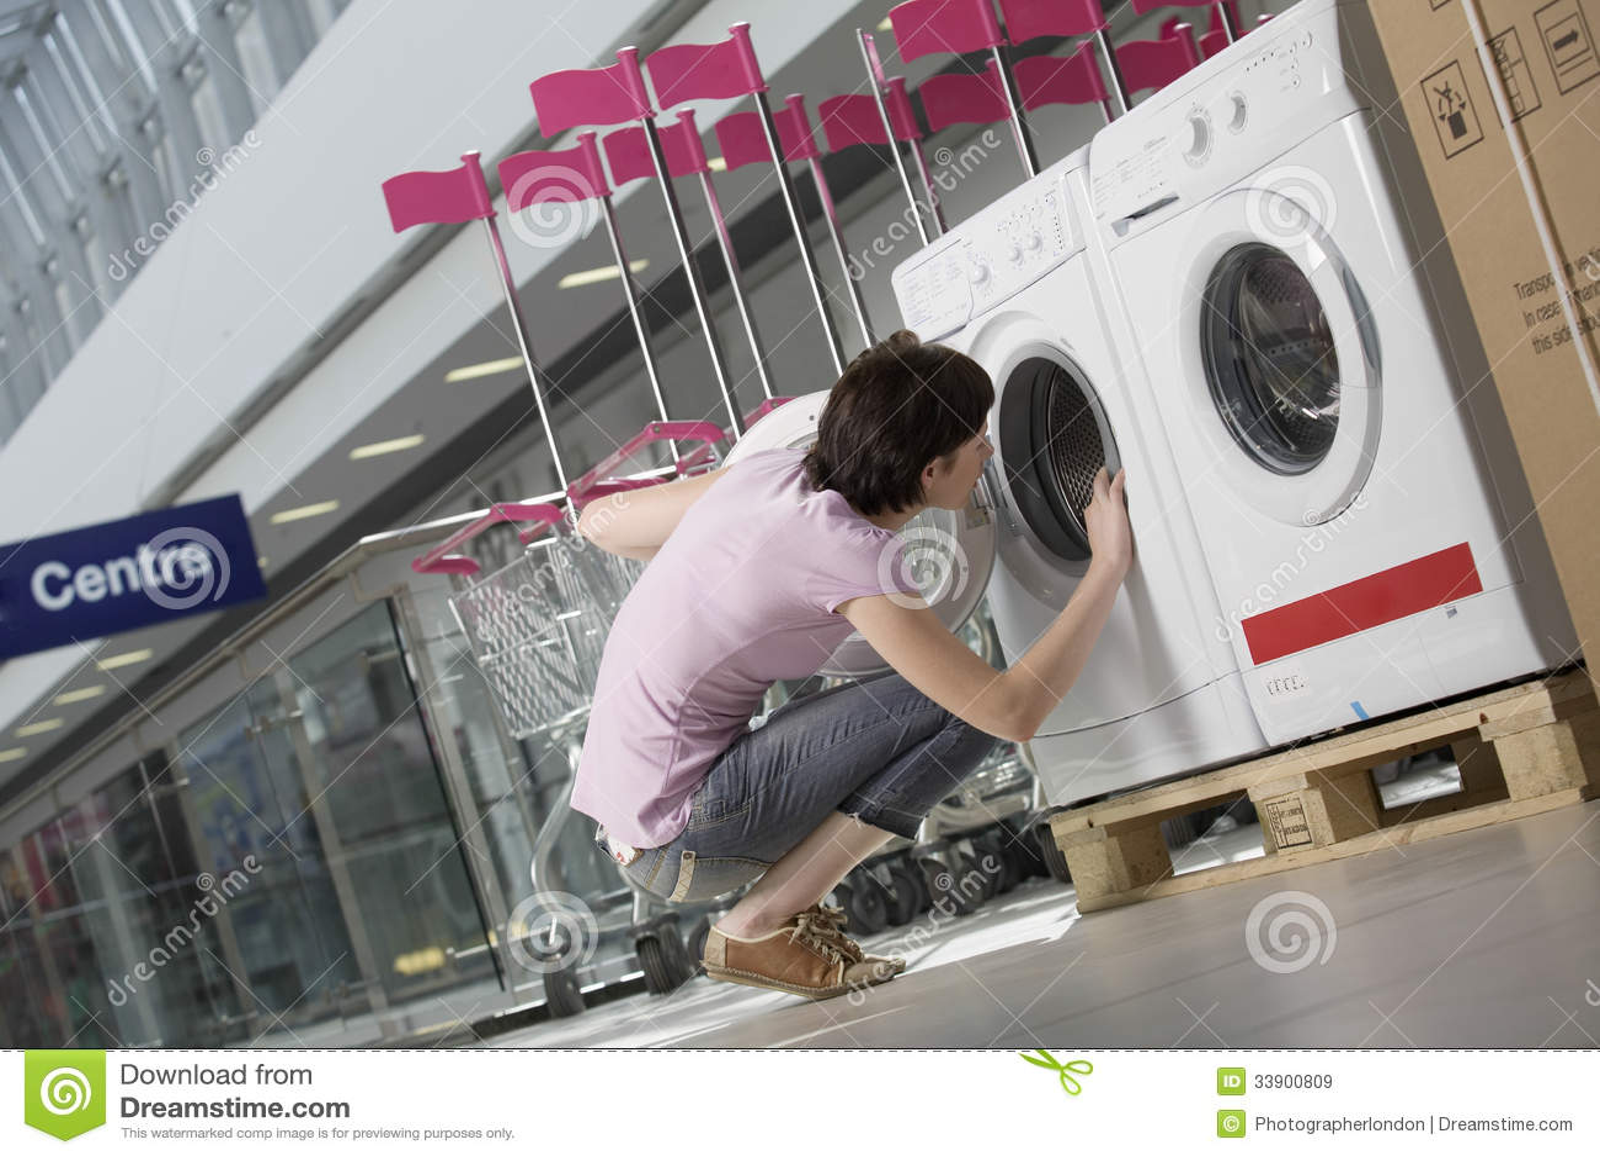 Woman Examining Front Loader Of Washing Machine